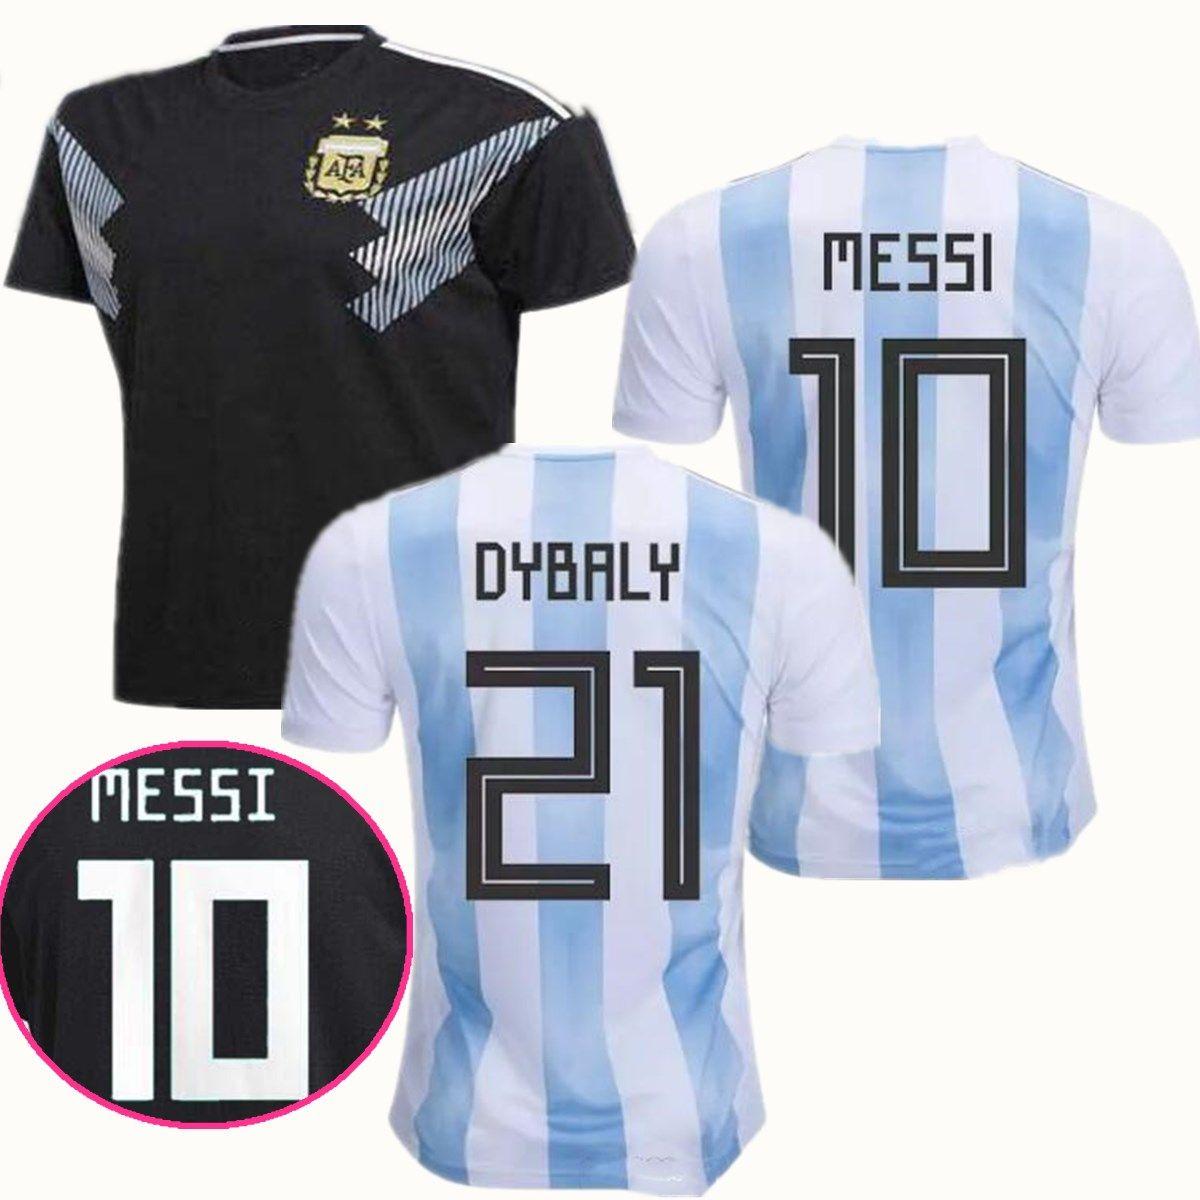 6484c0ab857 2019 Argentina 2018 Soccer Jerseys Home 2018 World Cup Away Black Jersey  DYBALA Messi Aguero Di Maria Mascherano Higuain Icardi Football Shirts From  ...